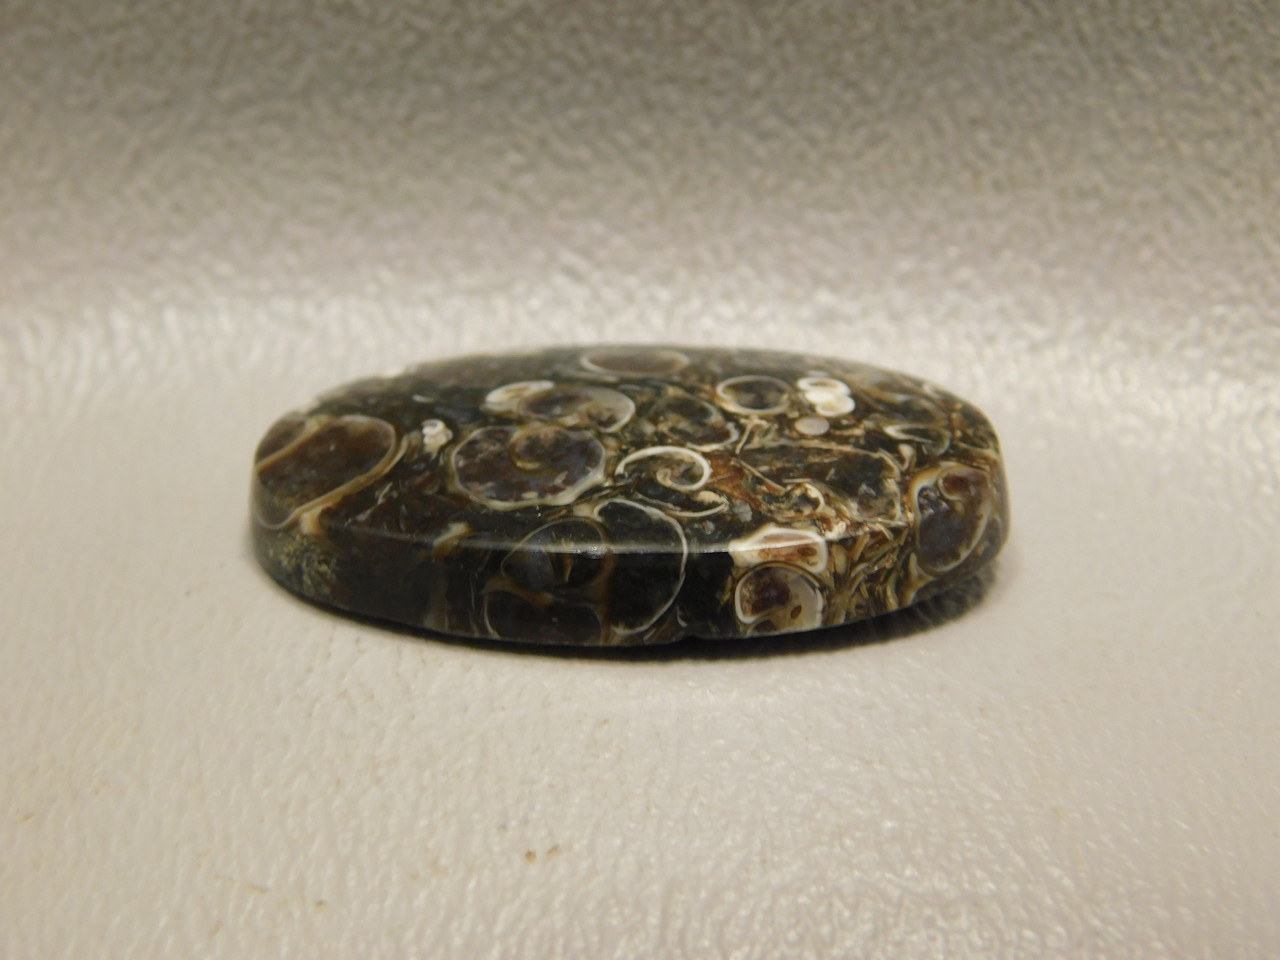 Turritella Agate Semiprecious Gemstone Fossil Cabochon #19